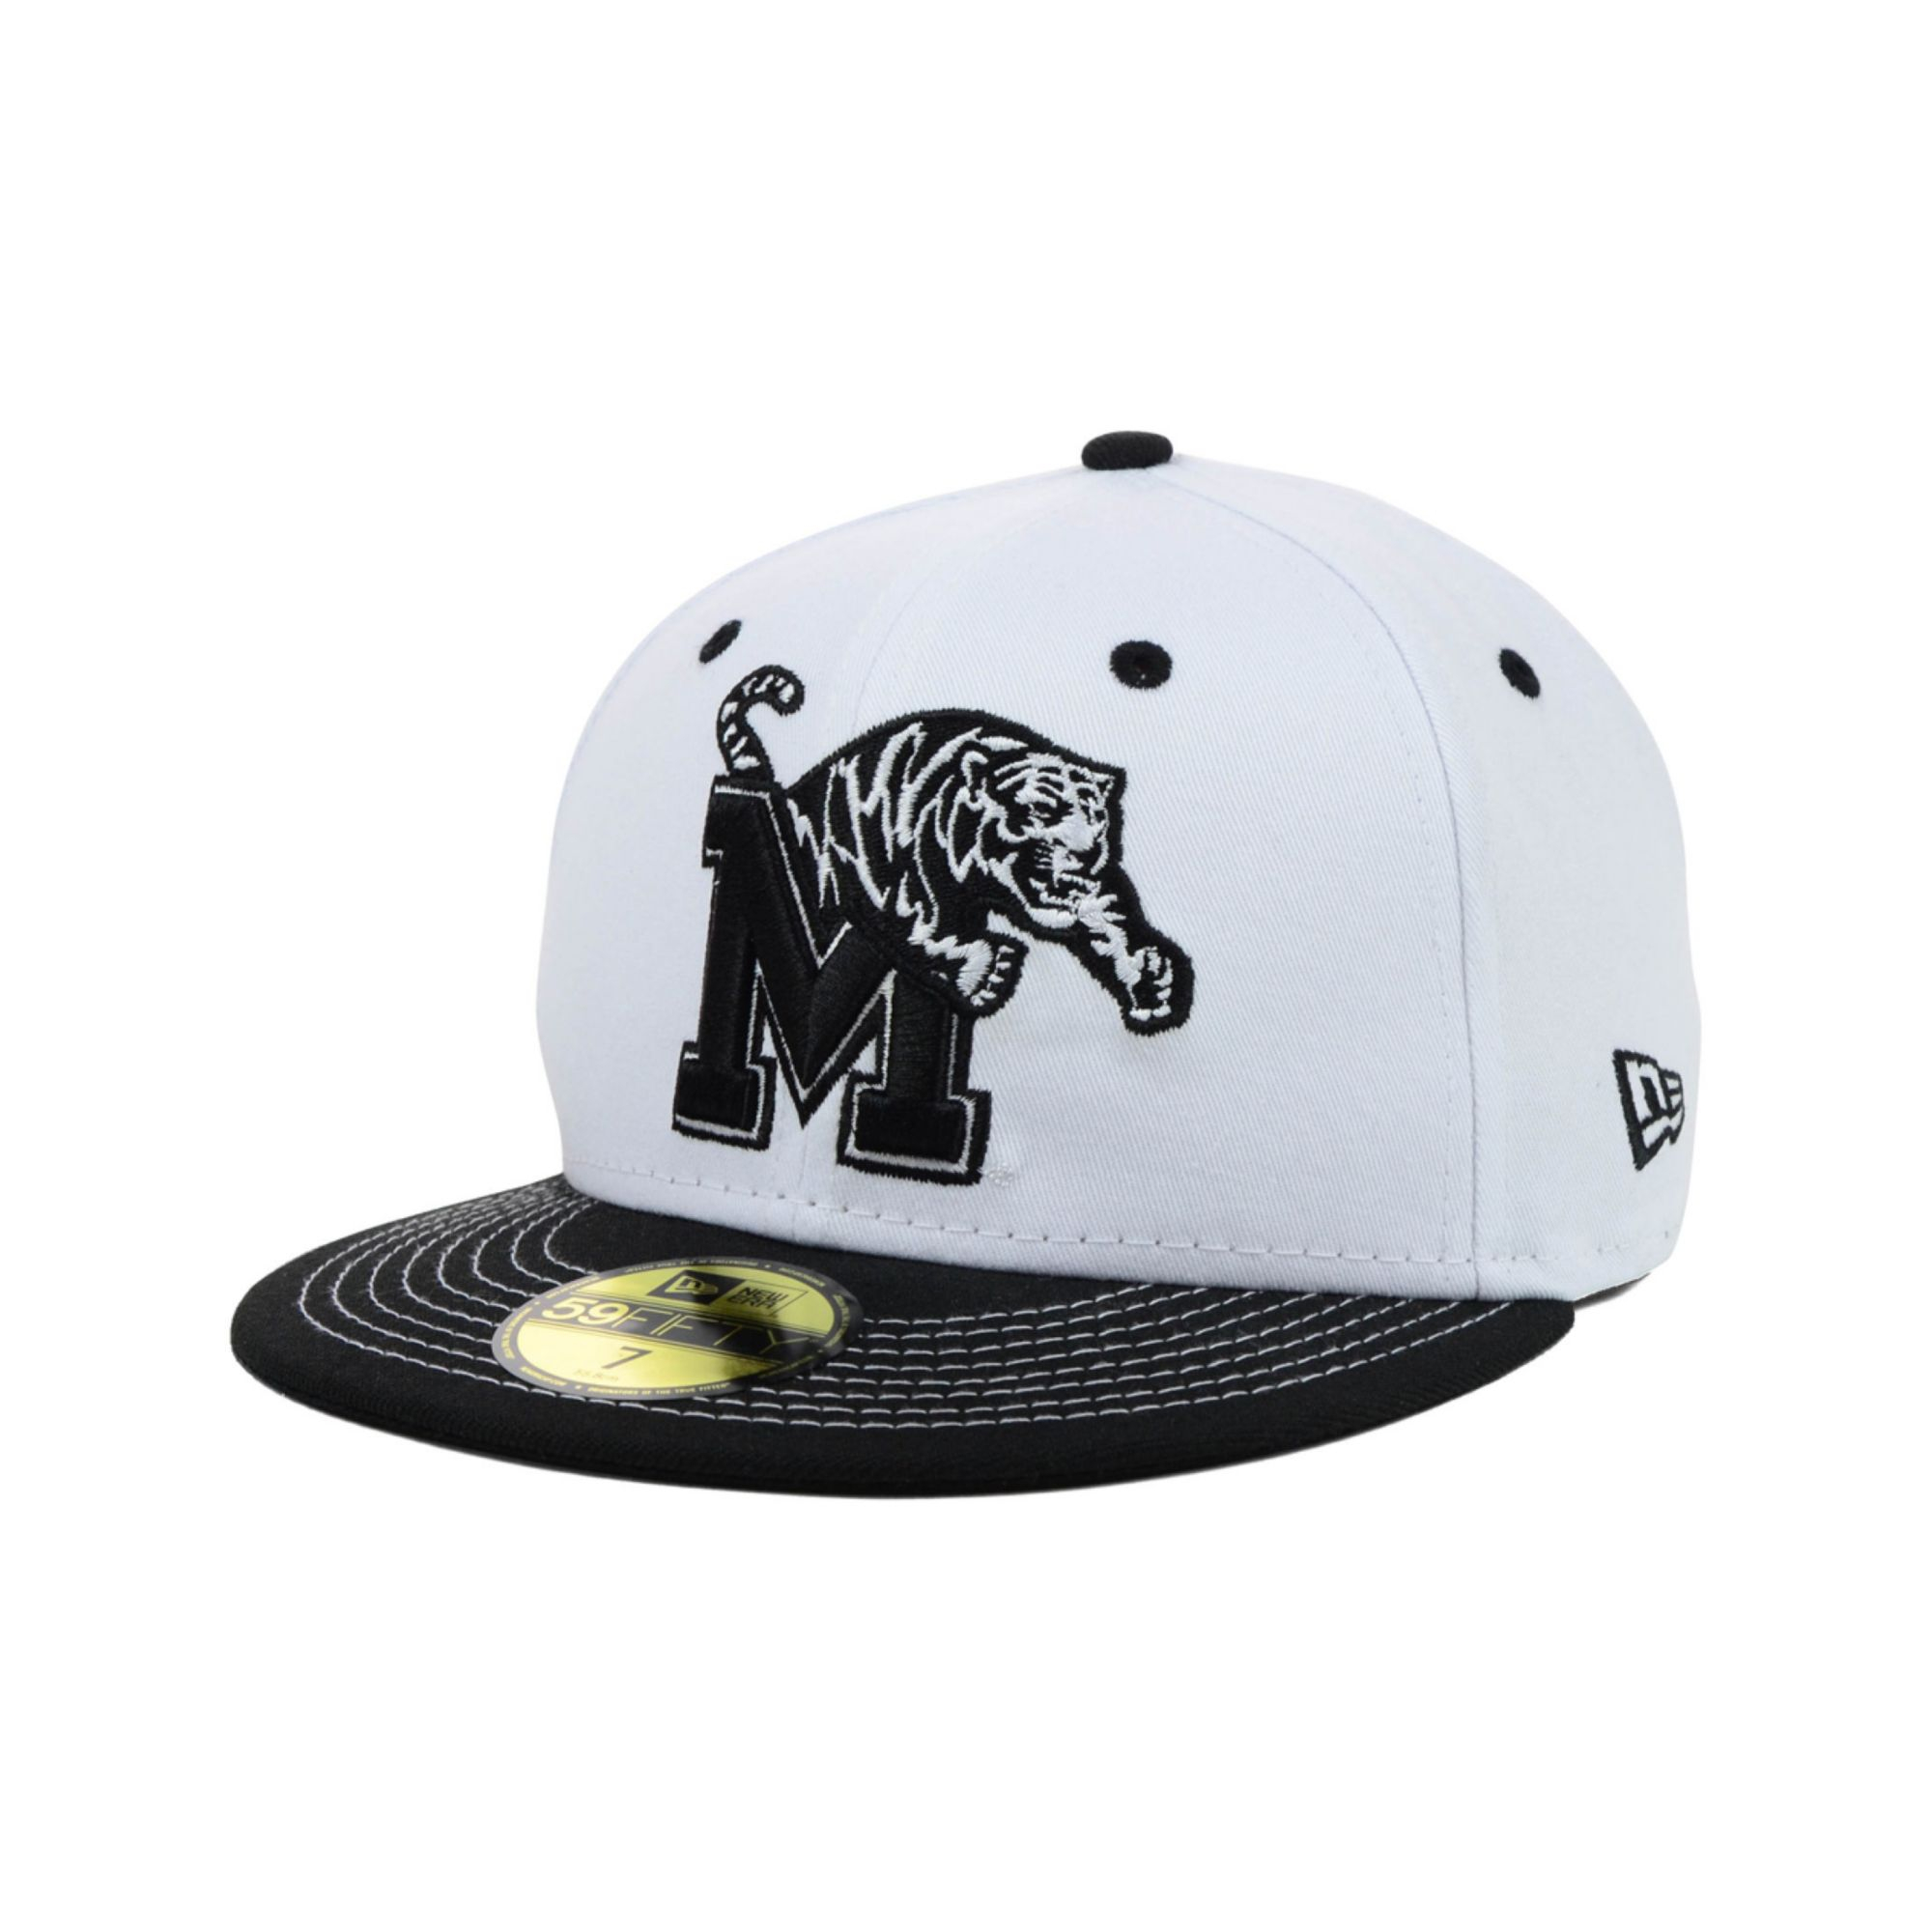 b7c2820d43e italy lyst ktz memphis tigers ncaa white black 59fifty cap in black for men  f40a0 67ec4